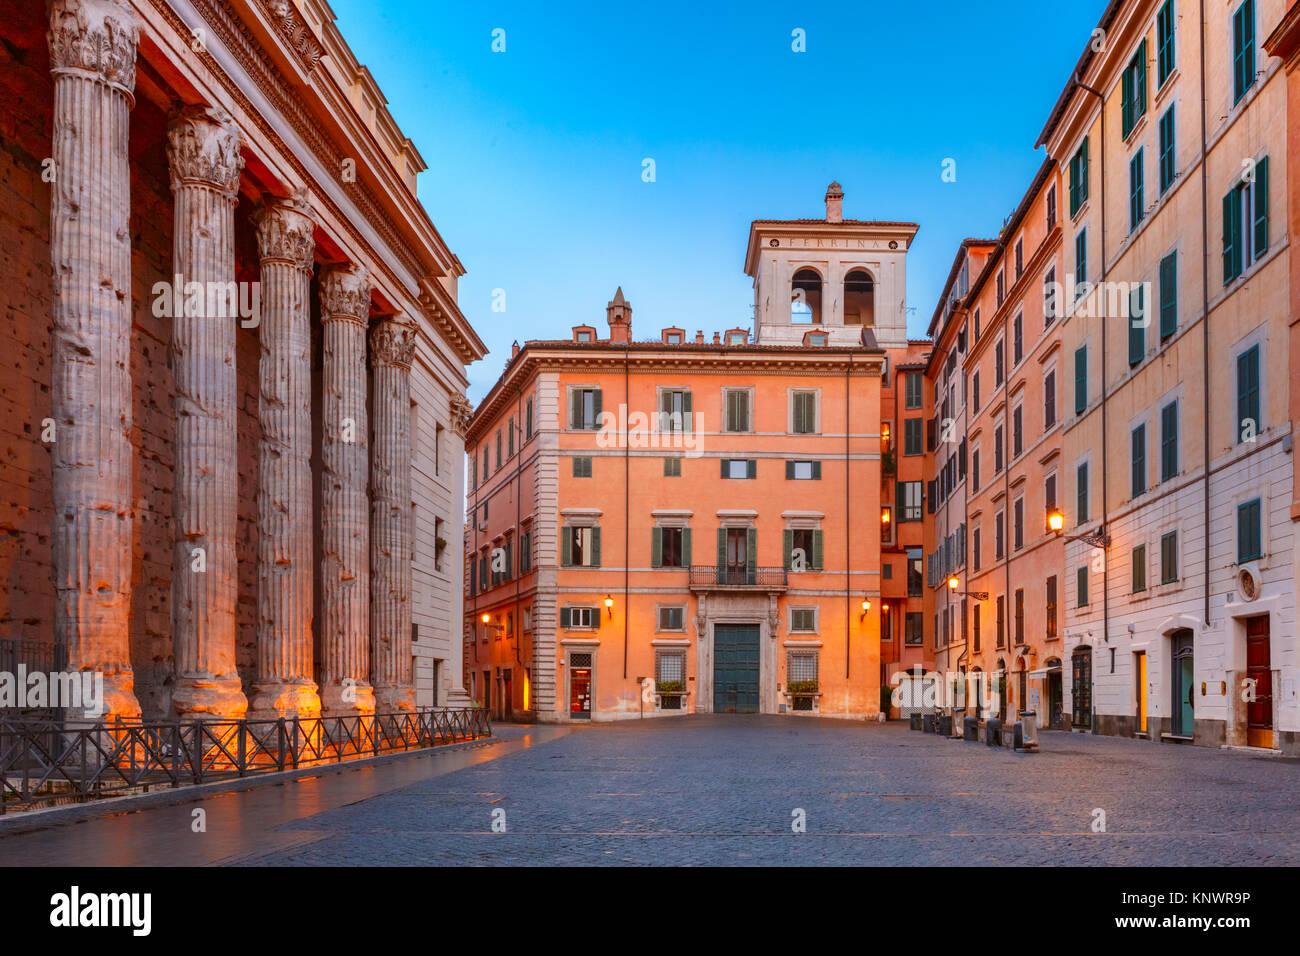 Piazza di Pietra in Rom, Italien. Stockbild